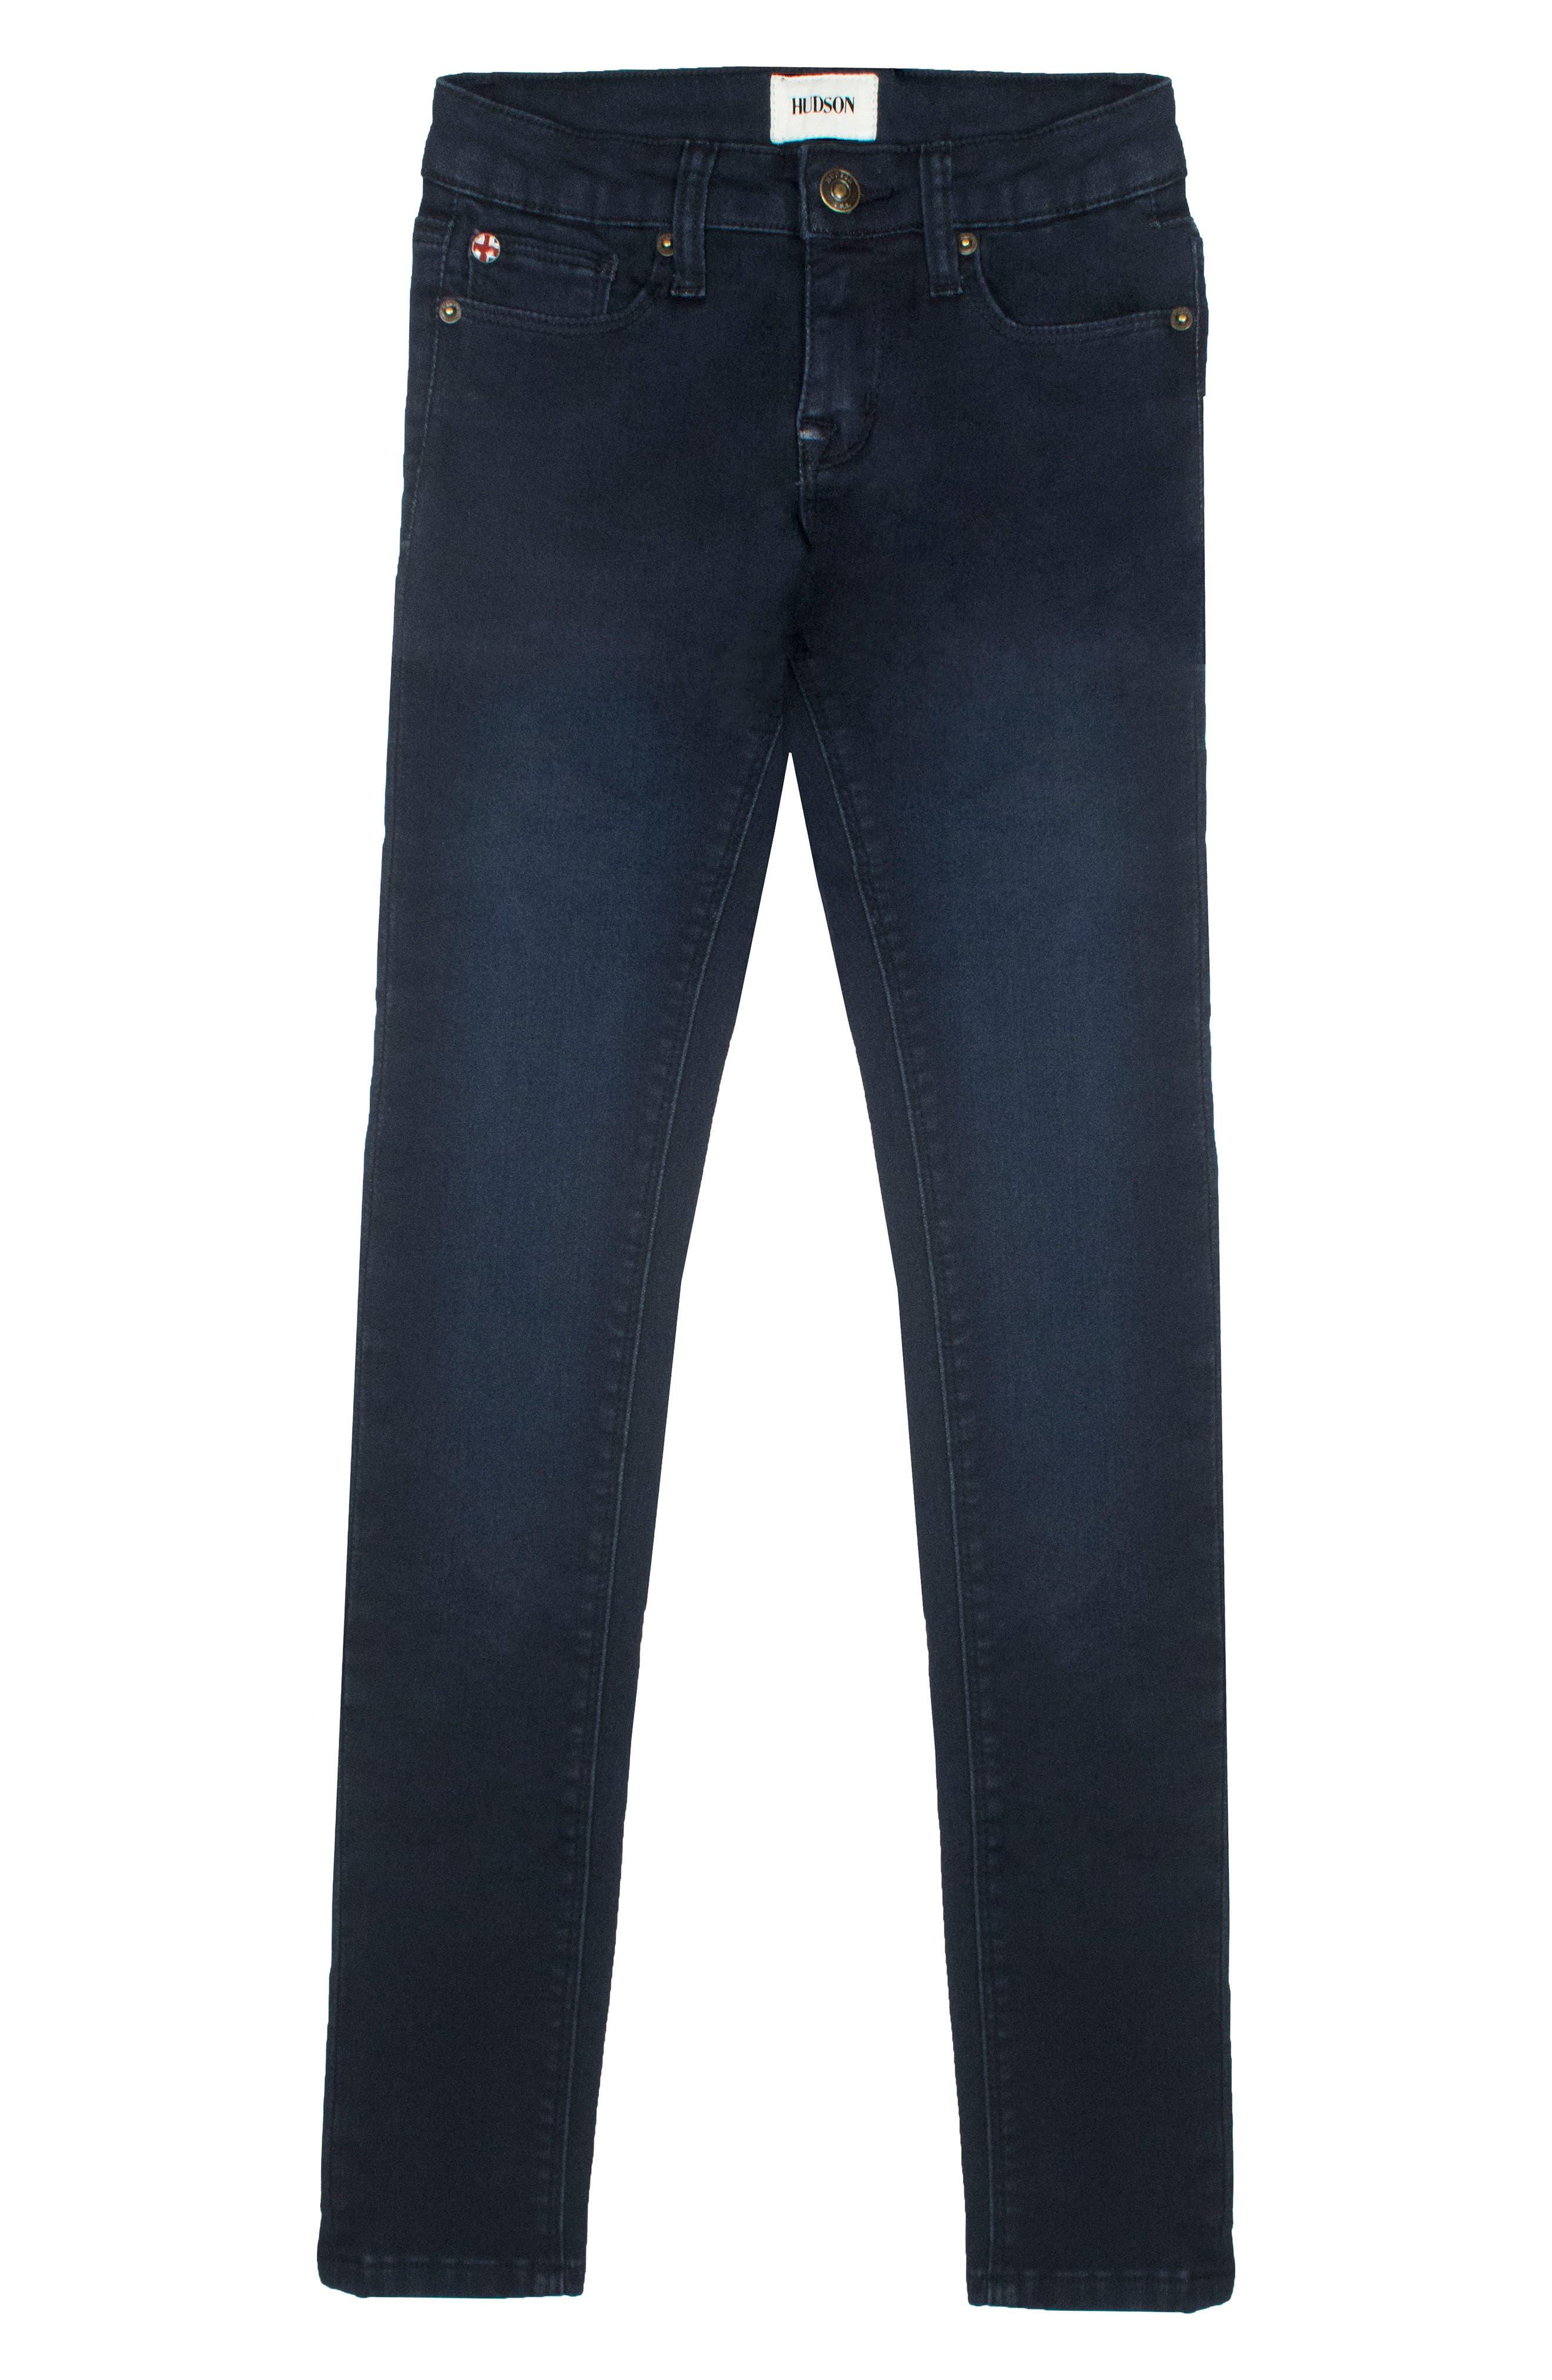 Hudson Kids Collin Flap Pocket Skinny Jeans (Toddler Girls & Little Girls)